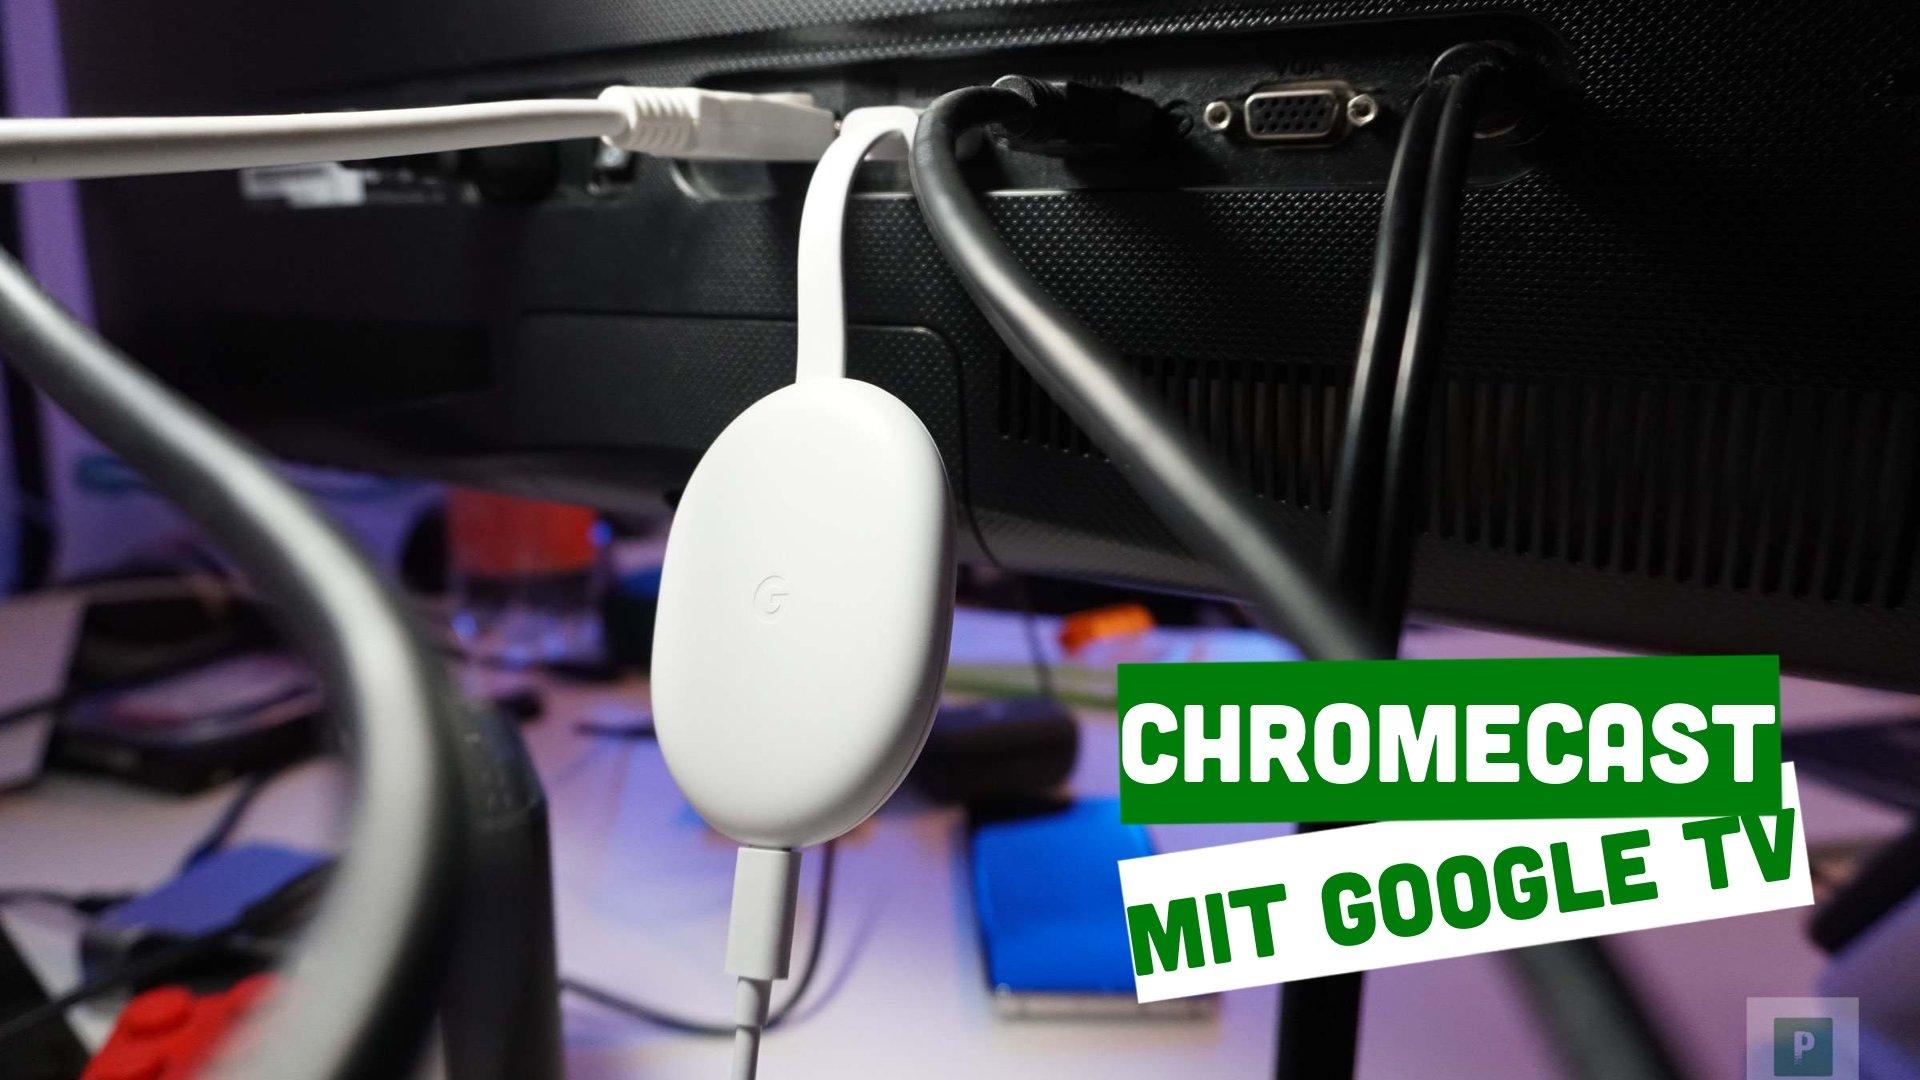 Video – Google Chromecast mit Google TV